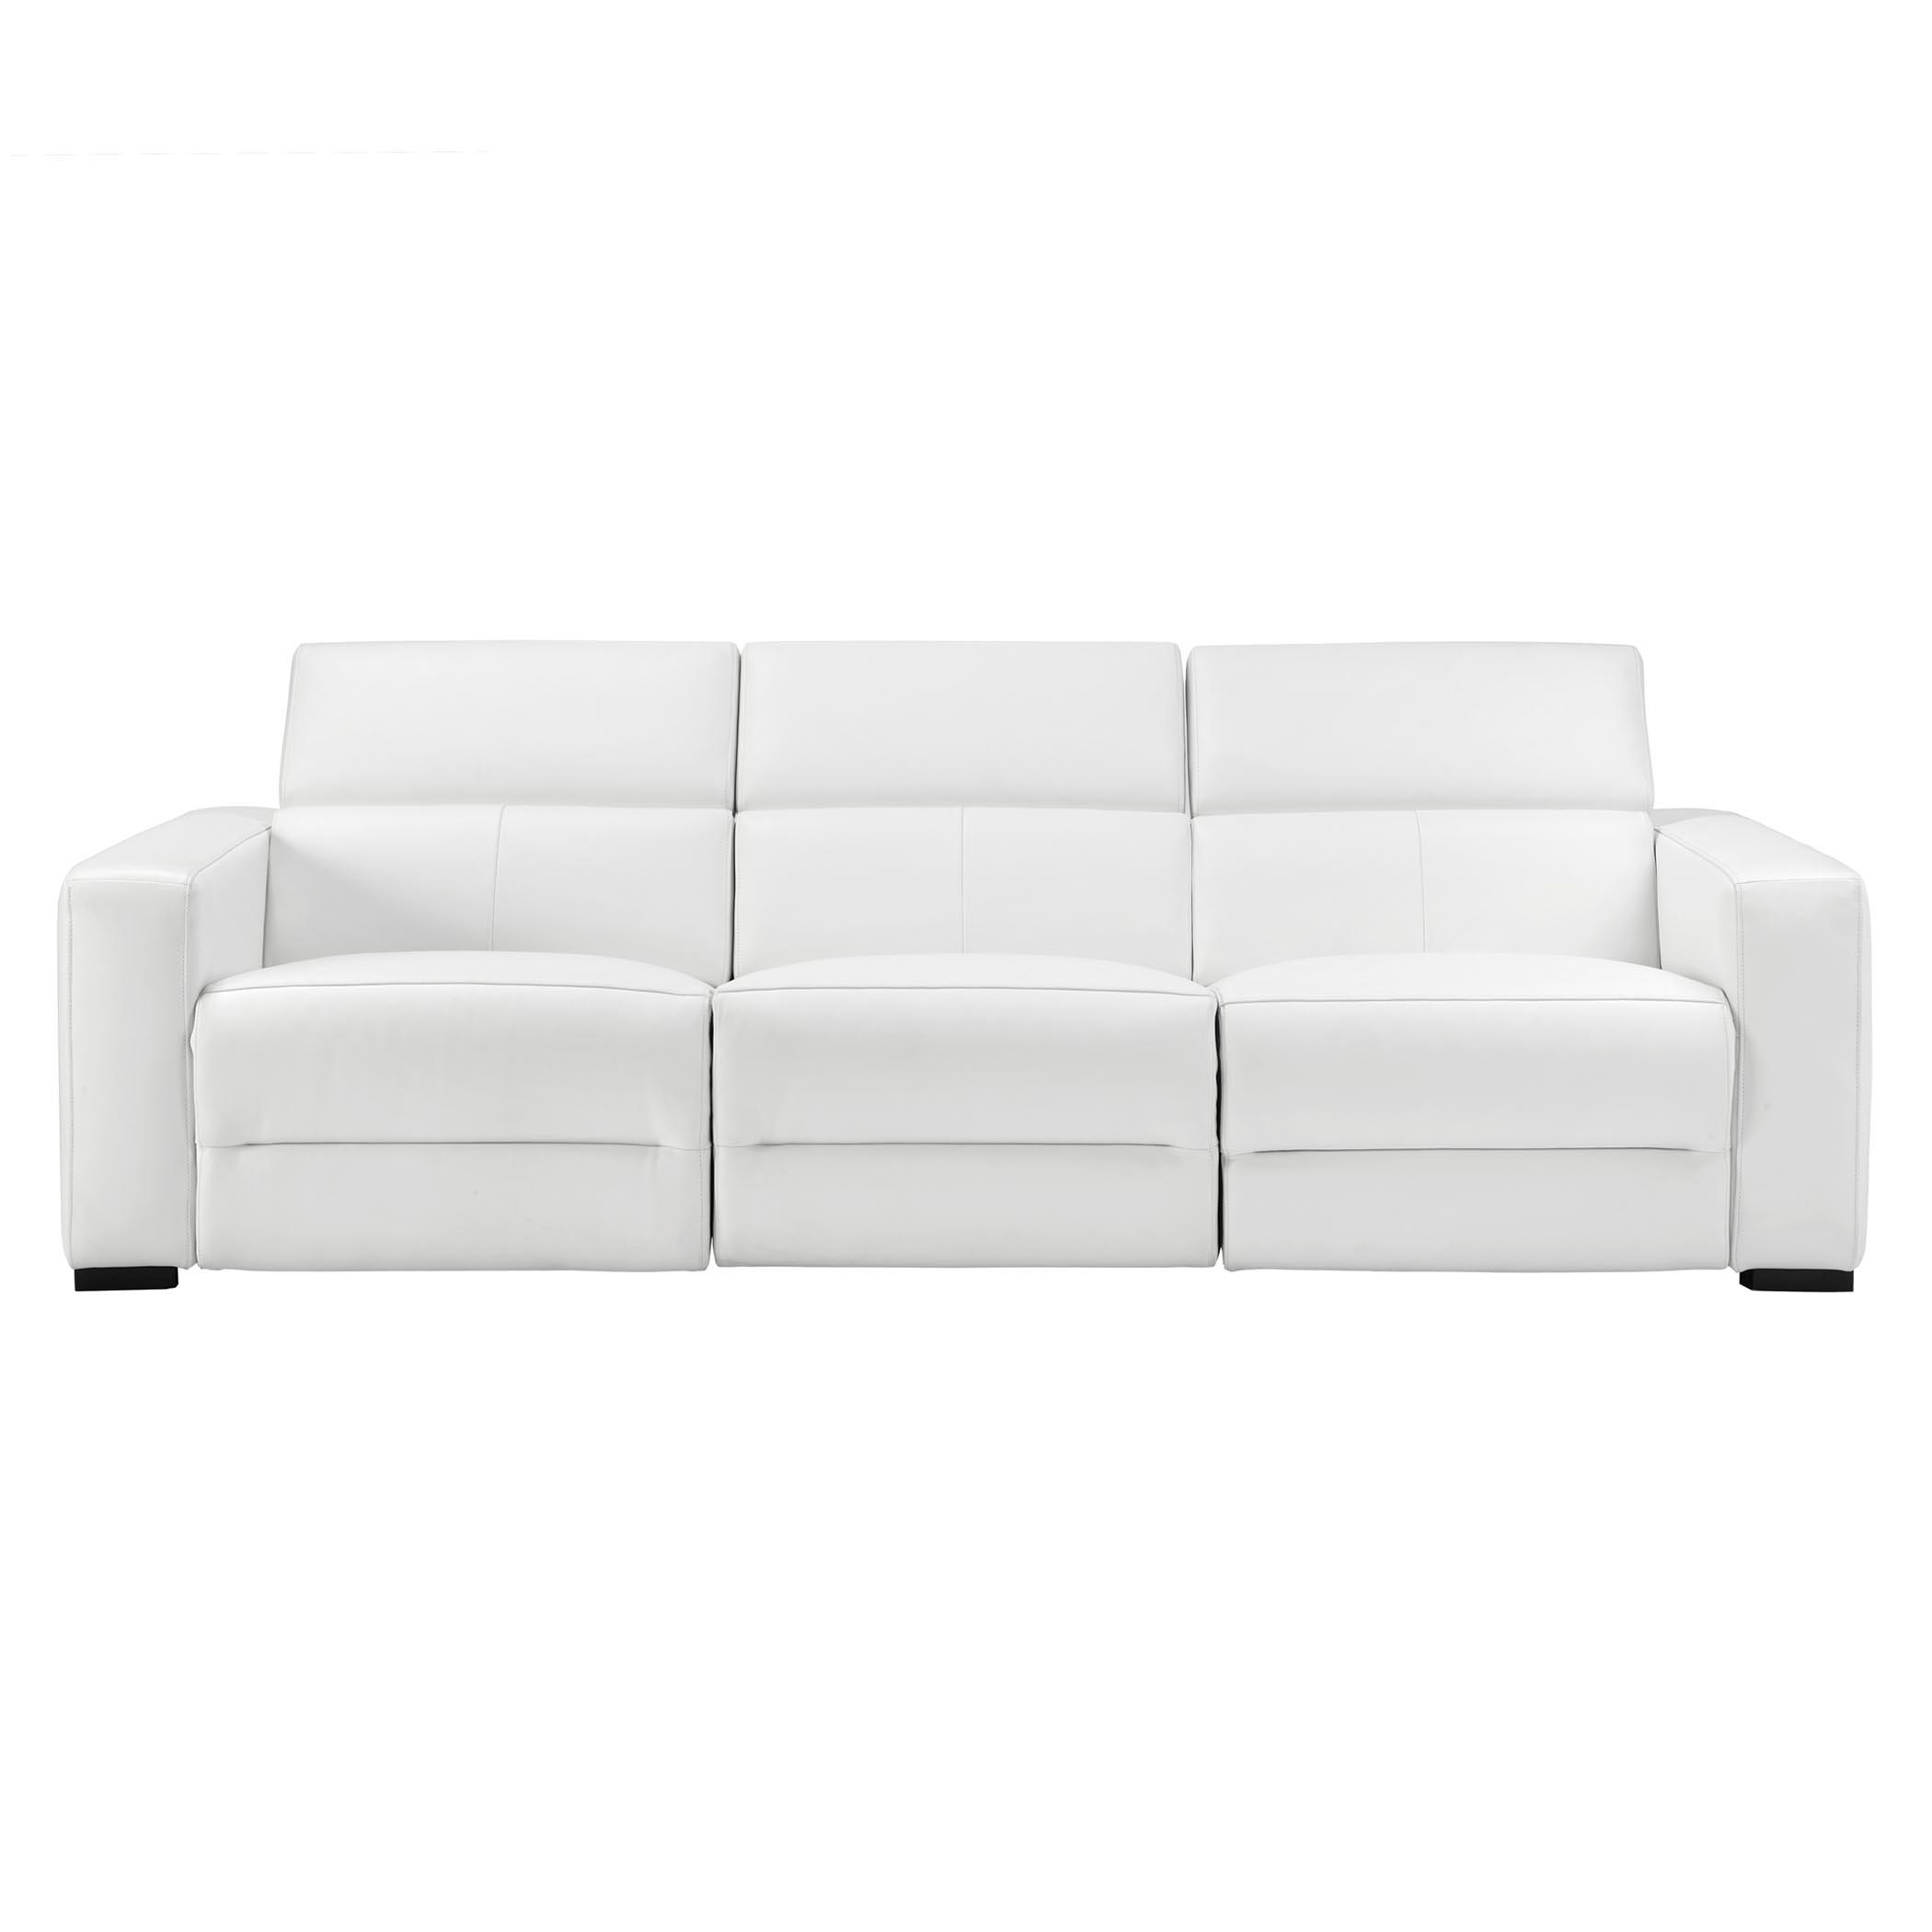 3 pc sofa